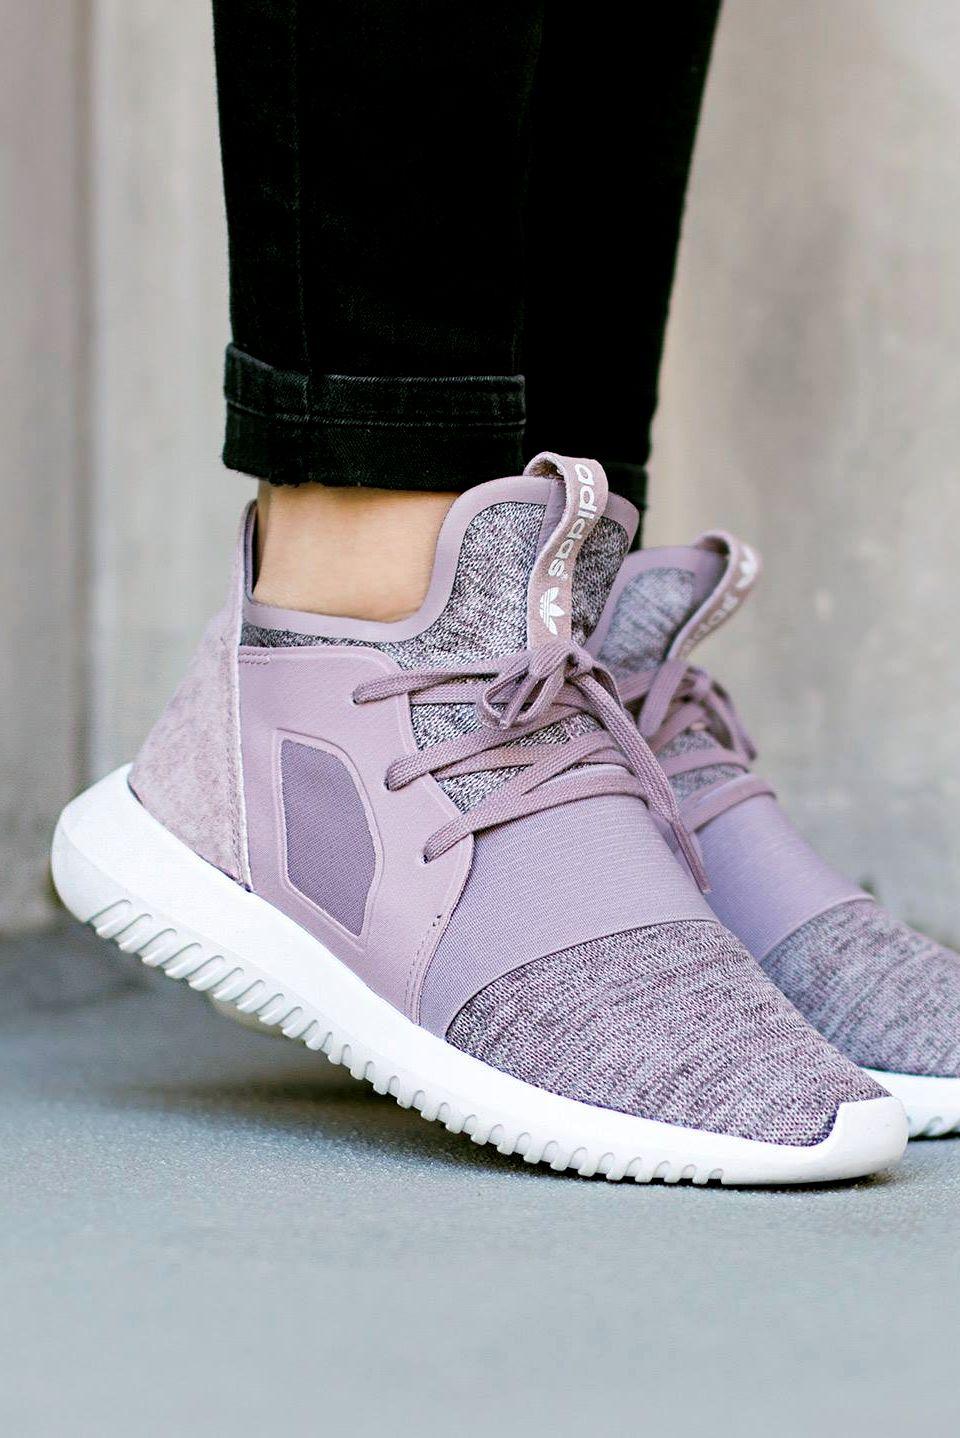 Wvia KicksSneakers Adidas Defiant Adidas Tubular hdCtsQrBox